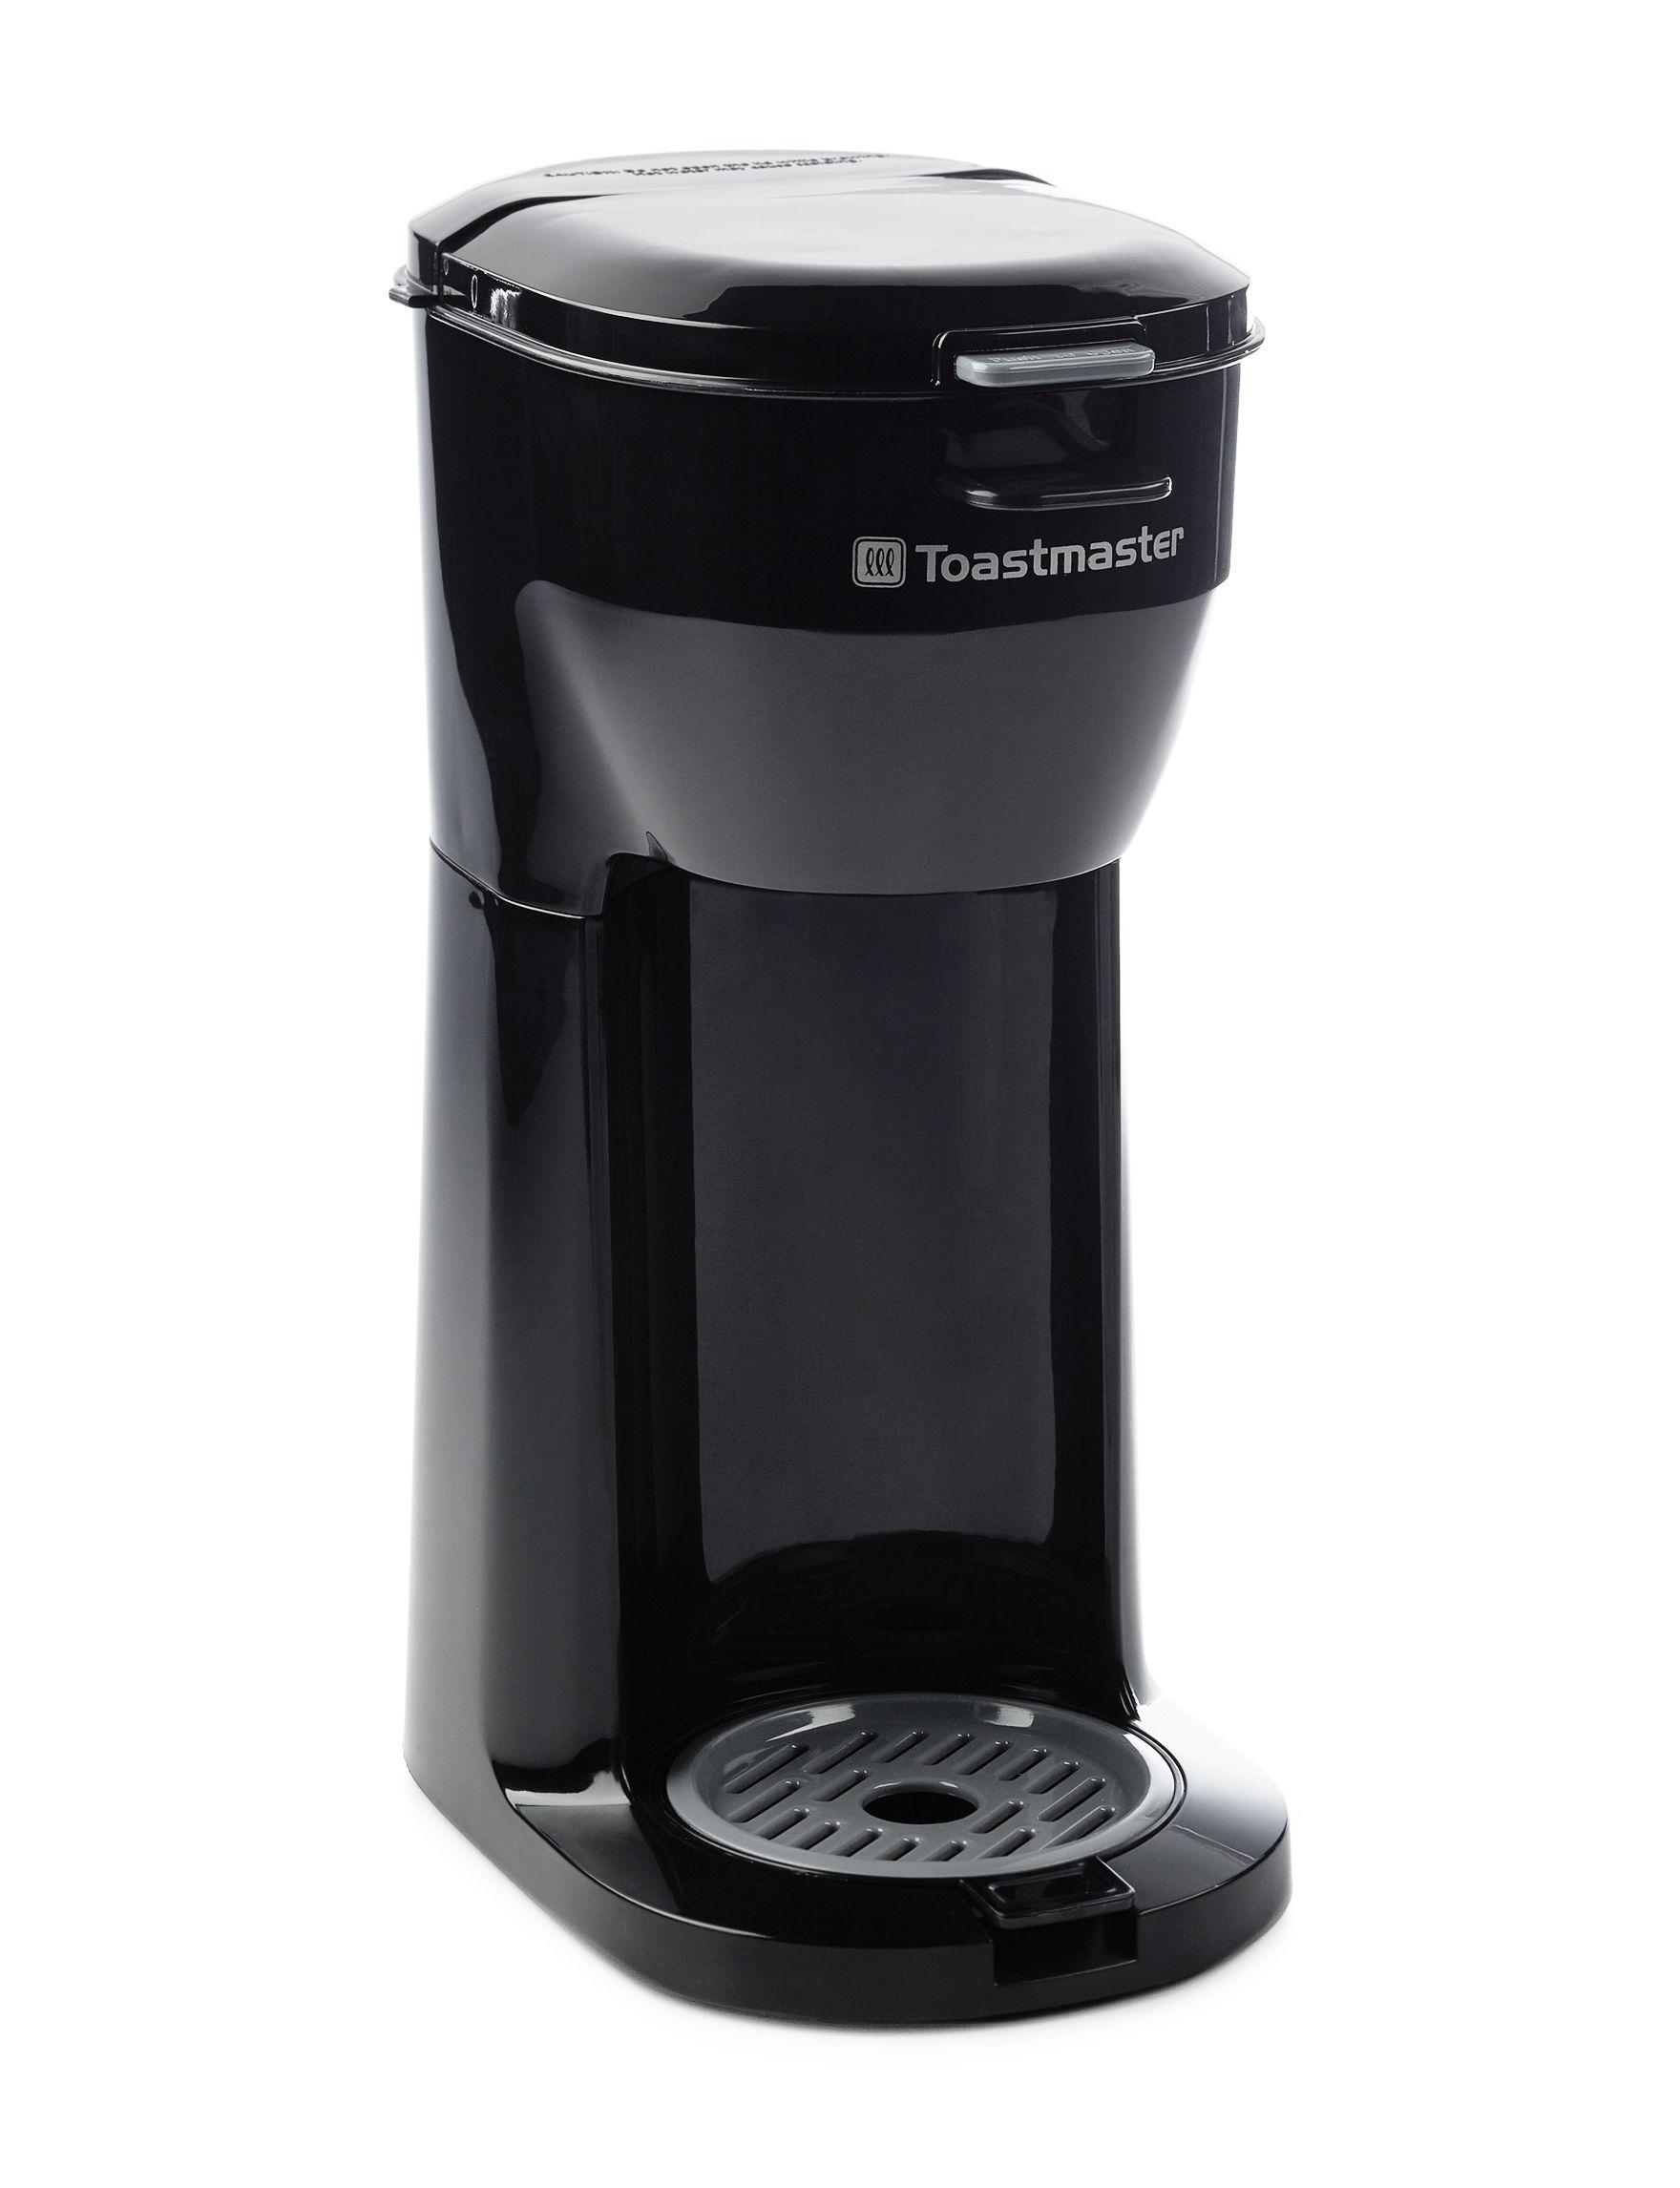 Toastmaster Black Coffee, Espresso & Tea Makers Kitchen Appliances